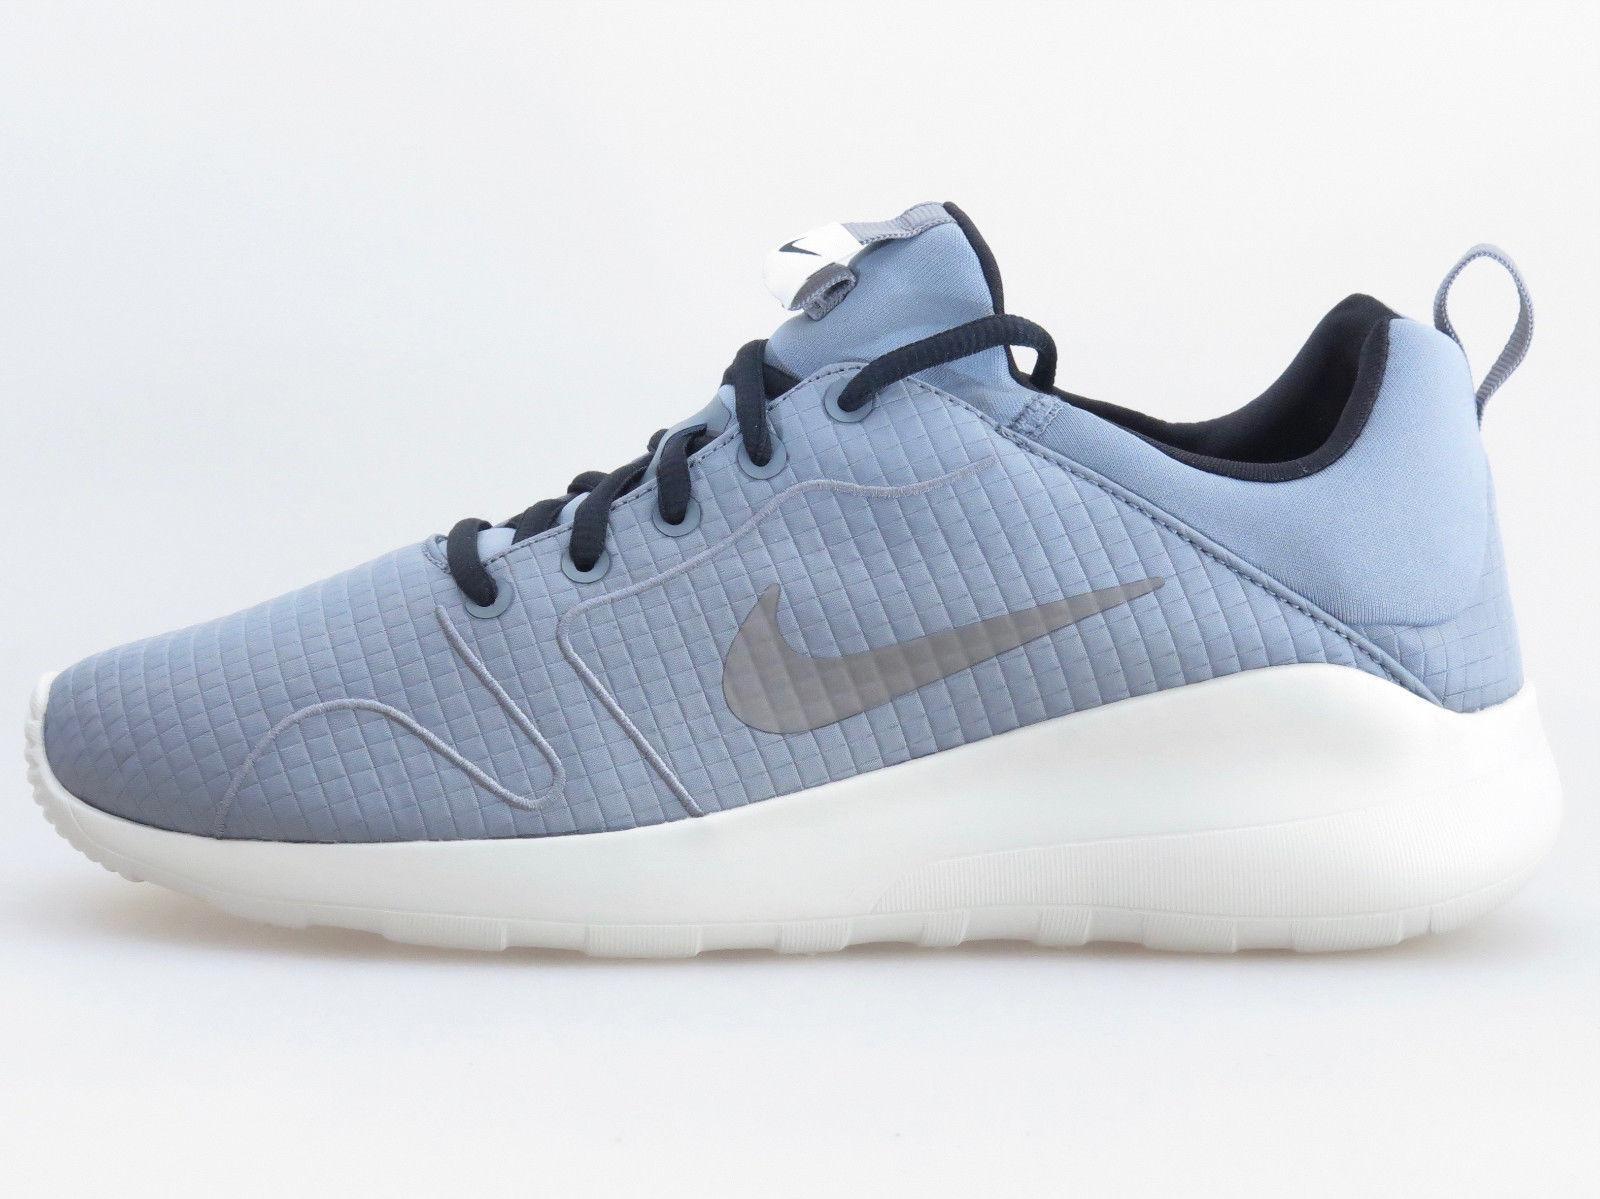 Nike Kaishi 2.0 PREM Premium  grigio  beige 876875 -001  Spedizione gratuita al 100%